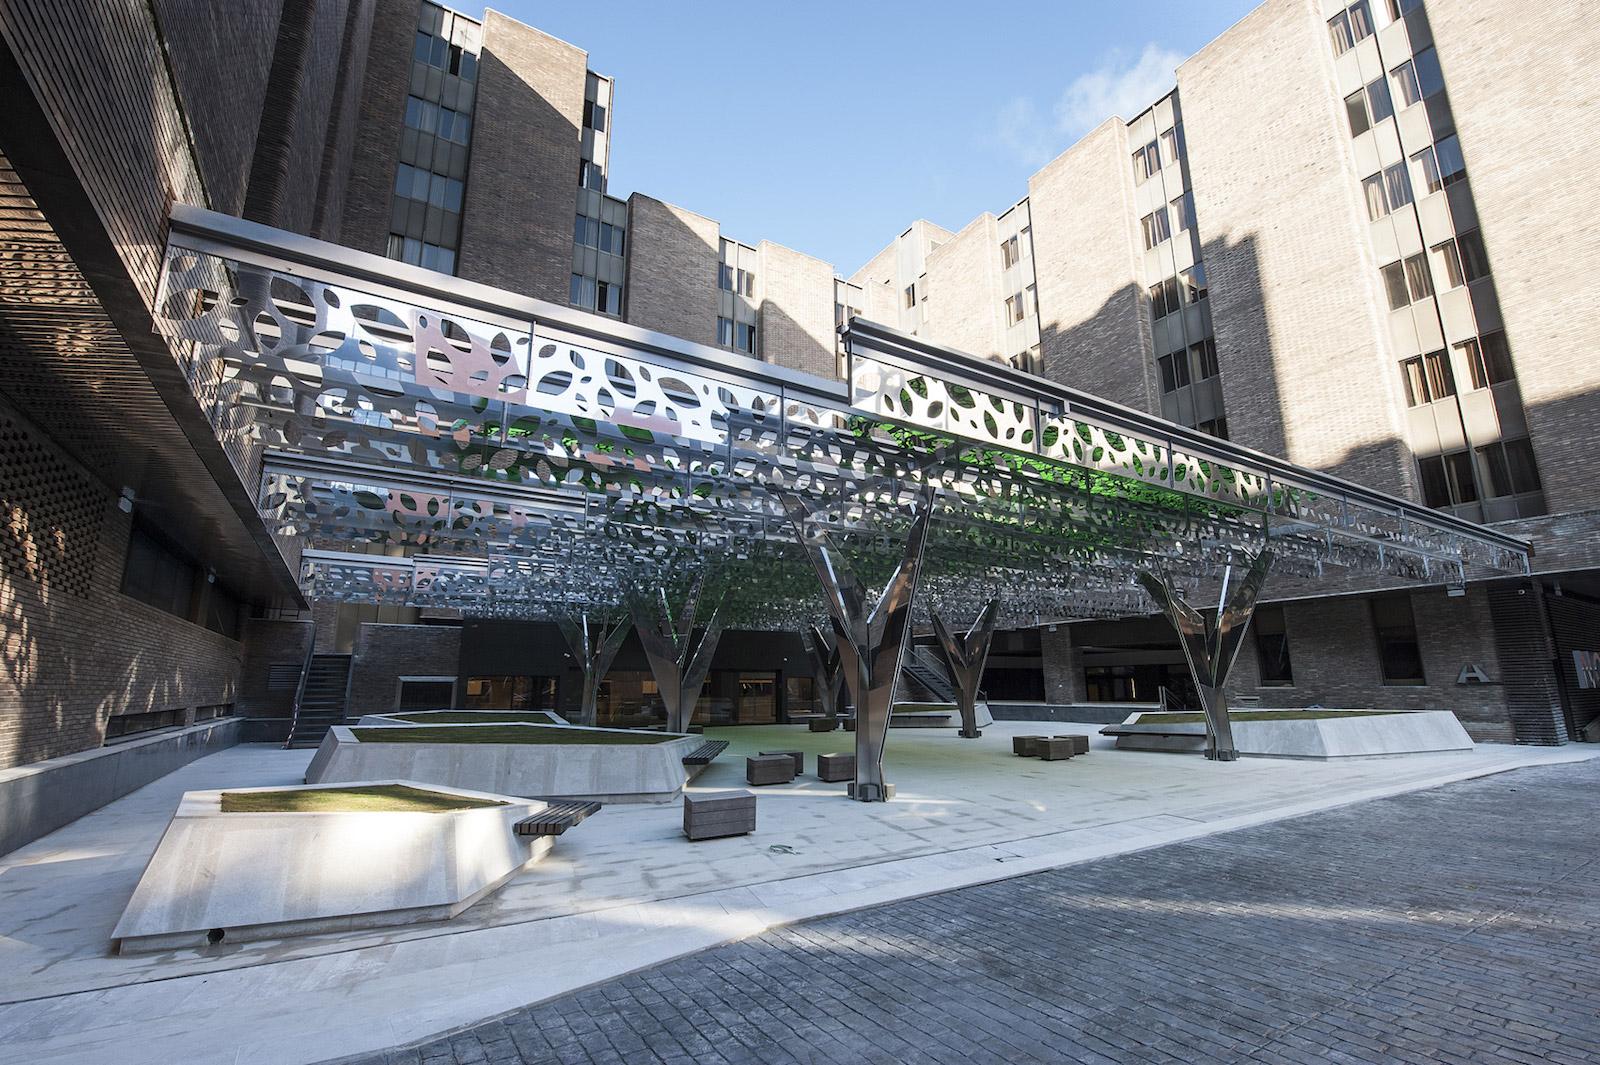 Novotel Madrid Center